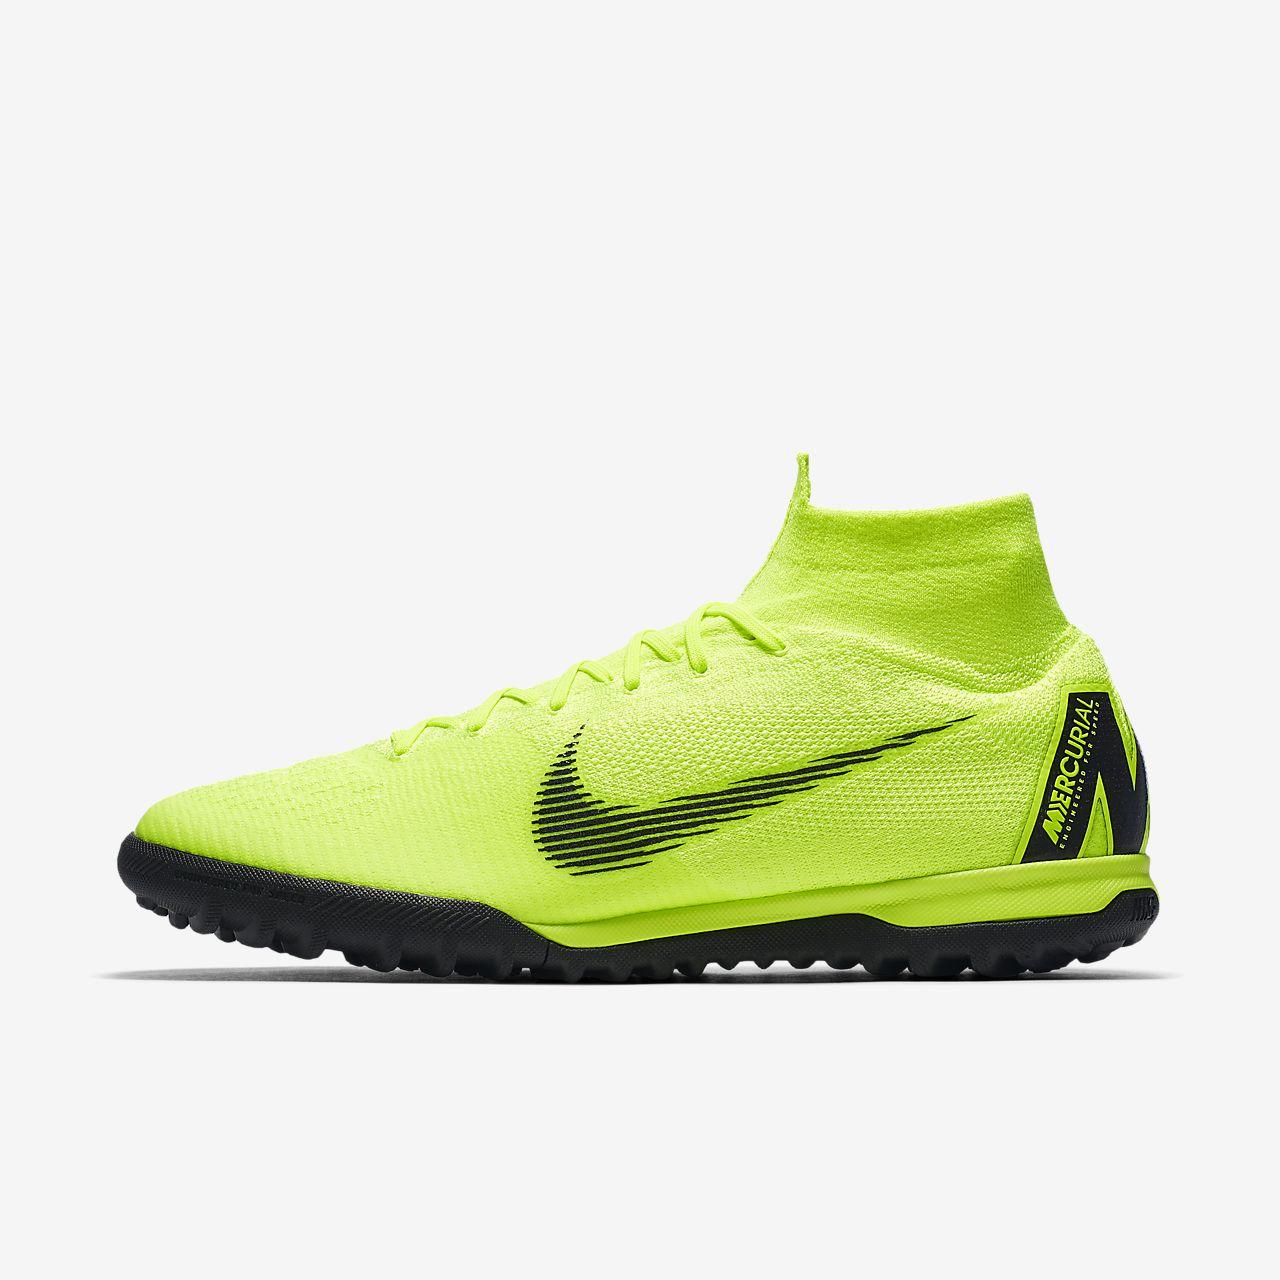 Nike Mercurialx Football Surface De Pour Chaussure Synthétique wX0O1nq